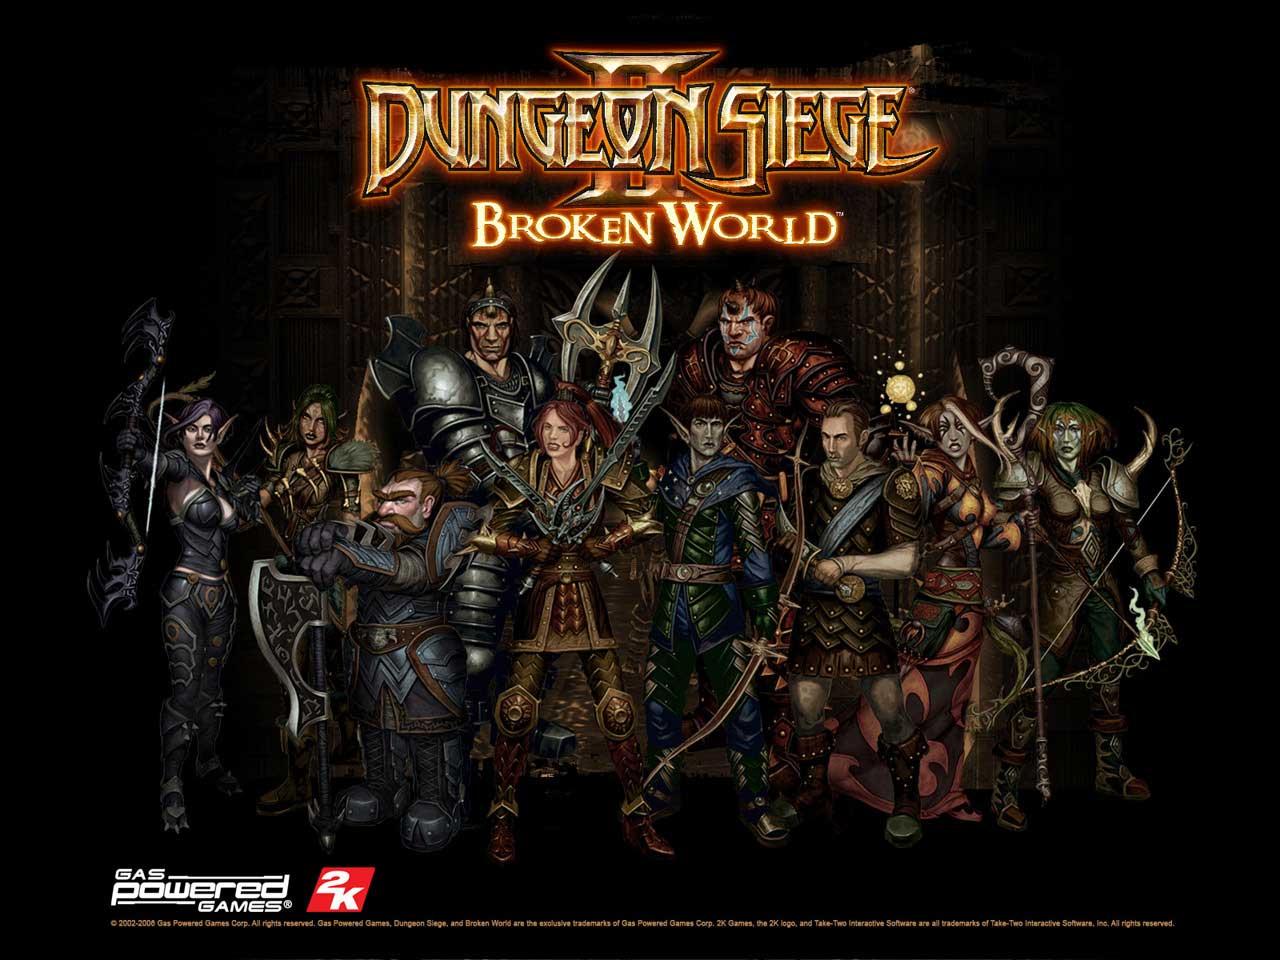 http://2.bp.blogspot.com/-XfCVur3yjf0/TiKO-M1usEI/AAAAAAAABn0/rB3Xf56ALc0/s1600/Dungeon+Siege+2+%25286%2529.jpg